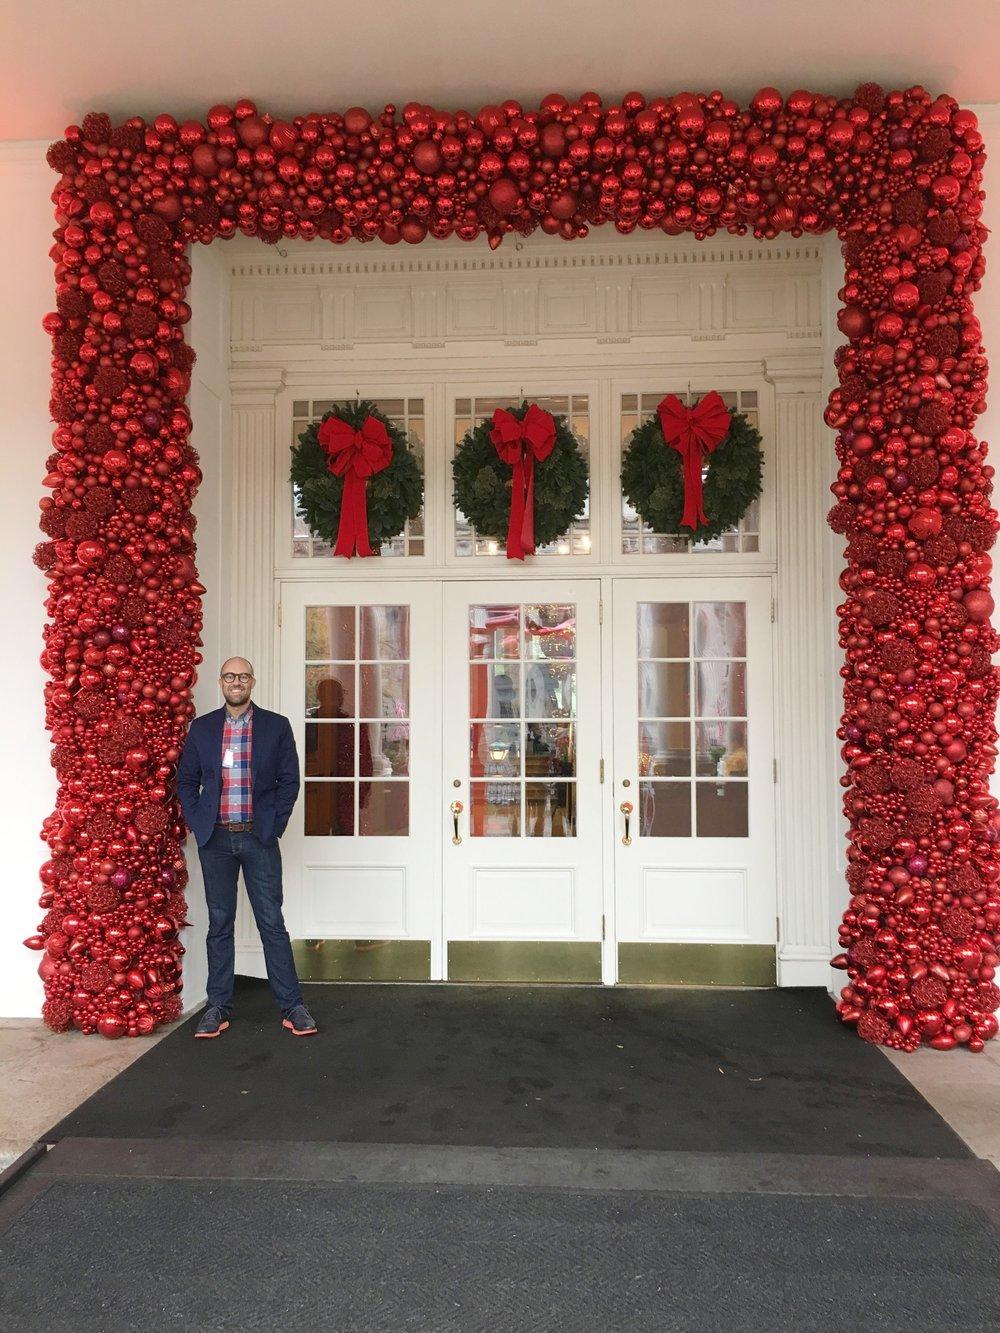 East Entrance, White House, Holiday 2016